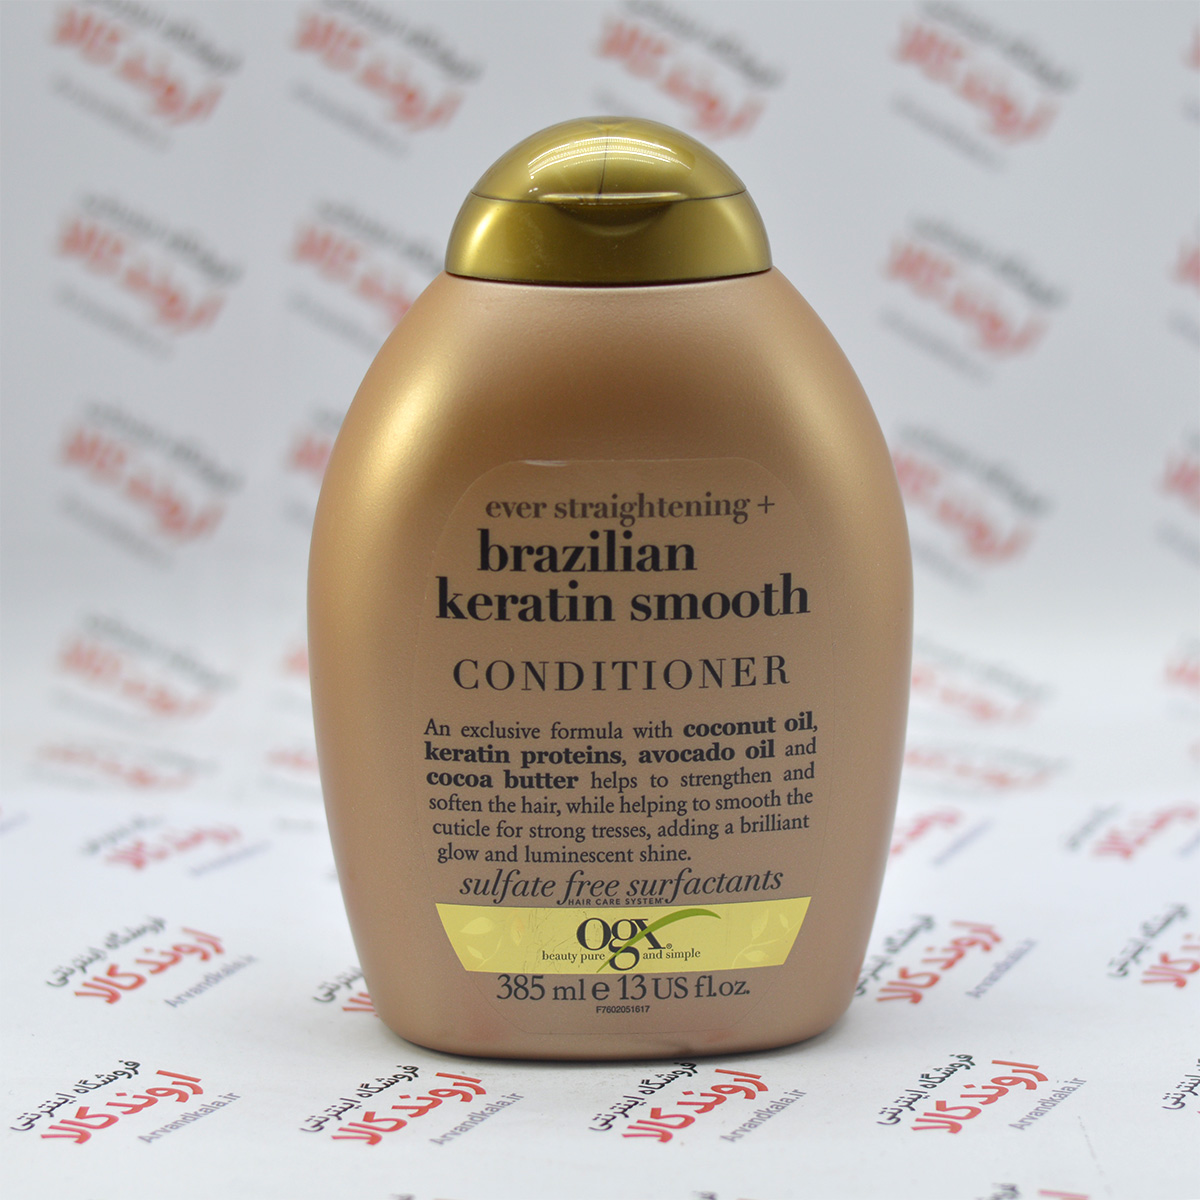 نرم کننده مو بدون سولفات او جی ایکس Ogx مدل Keratin Smooth